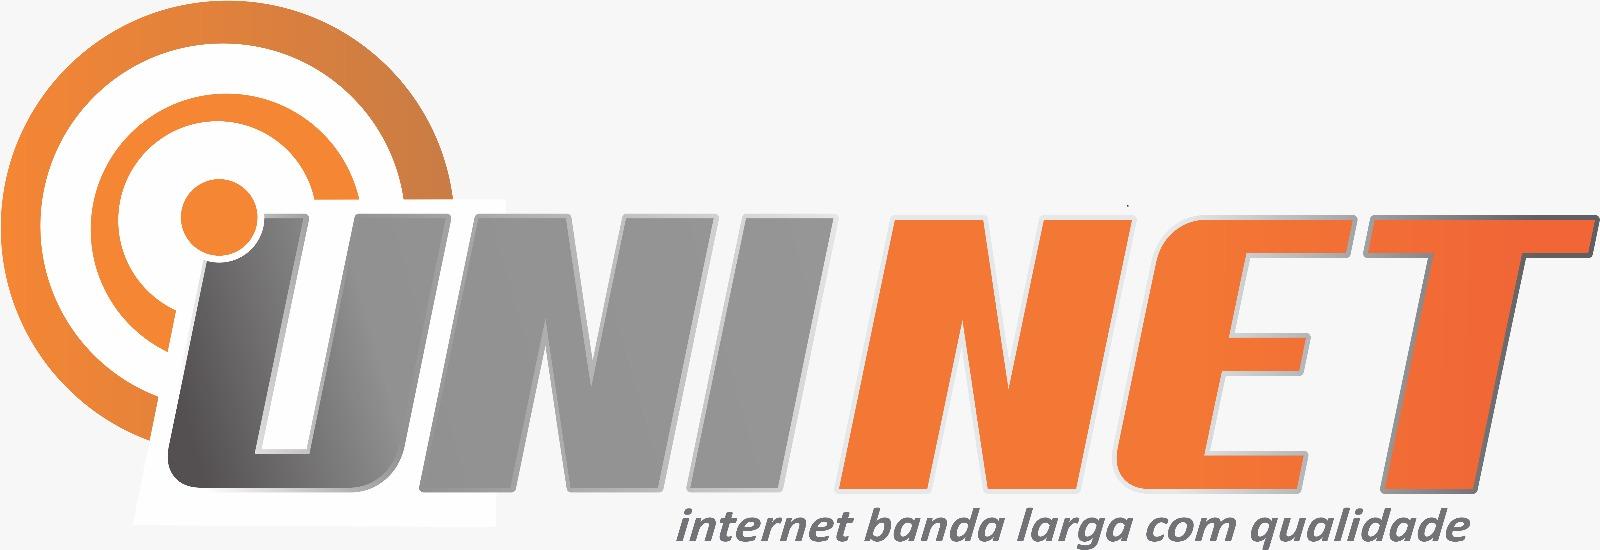 UniNet Internet Banda Larga com Qualidade